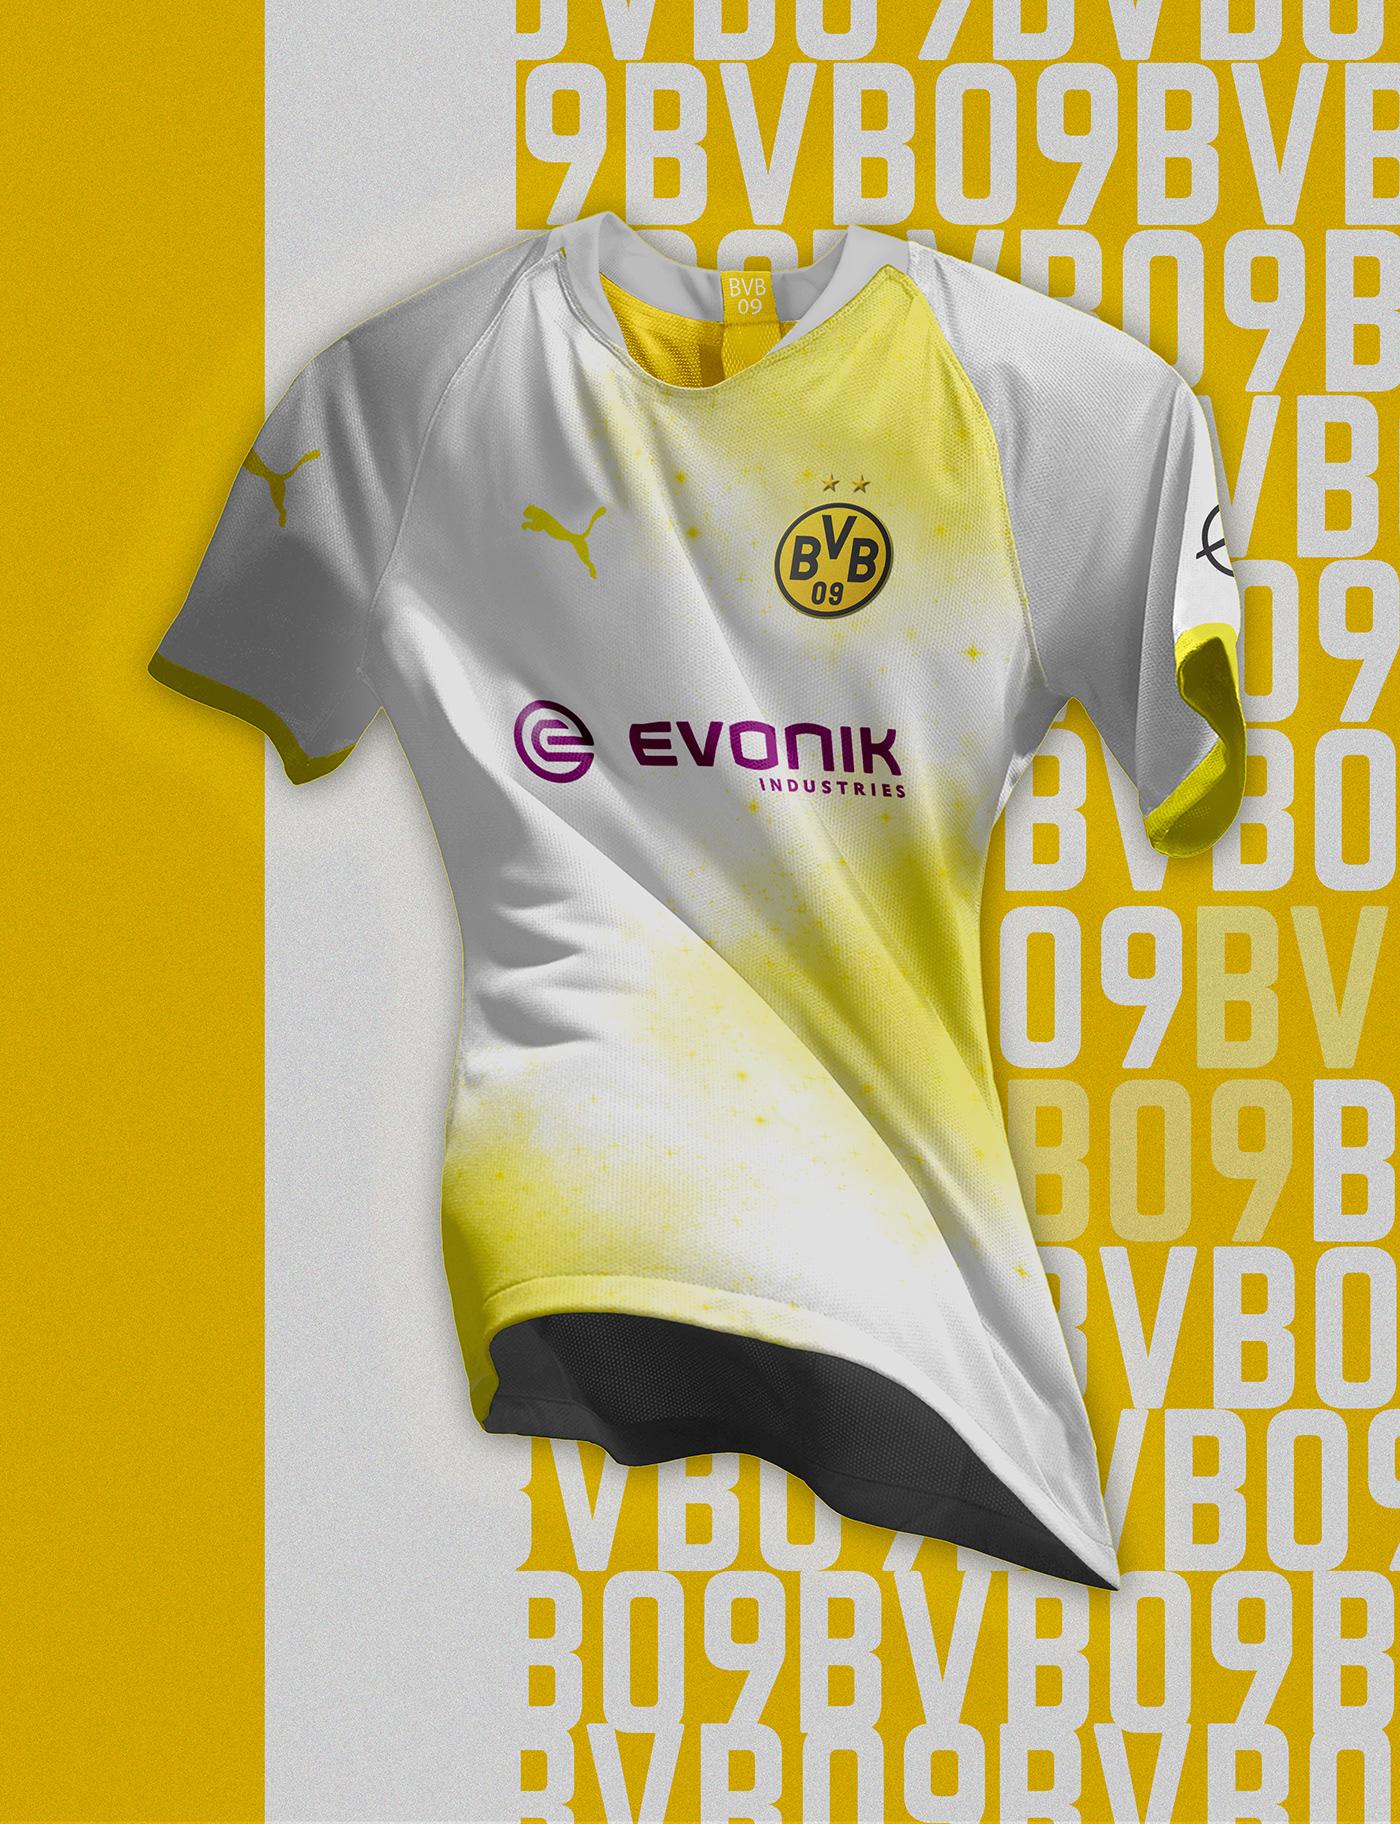 bvb borussia Borussia Dortmund soccer Futbol kit equipacion